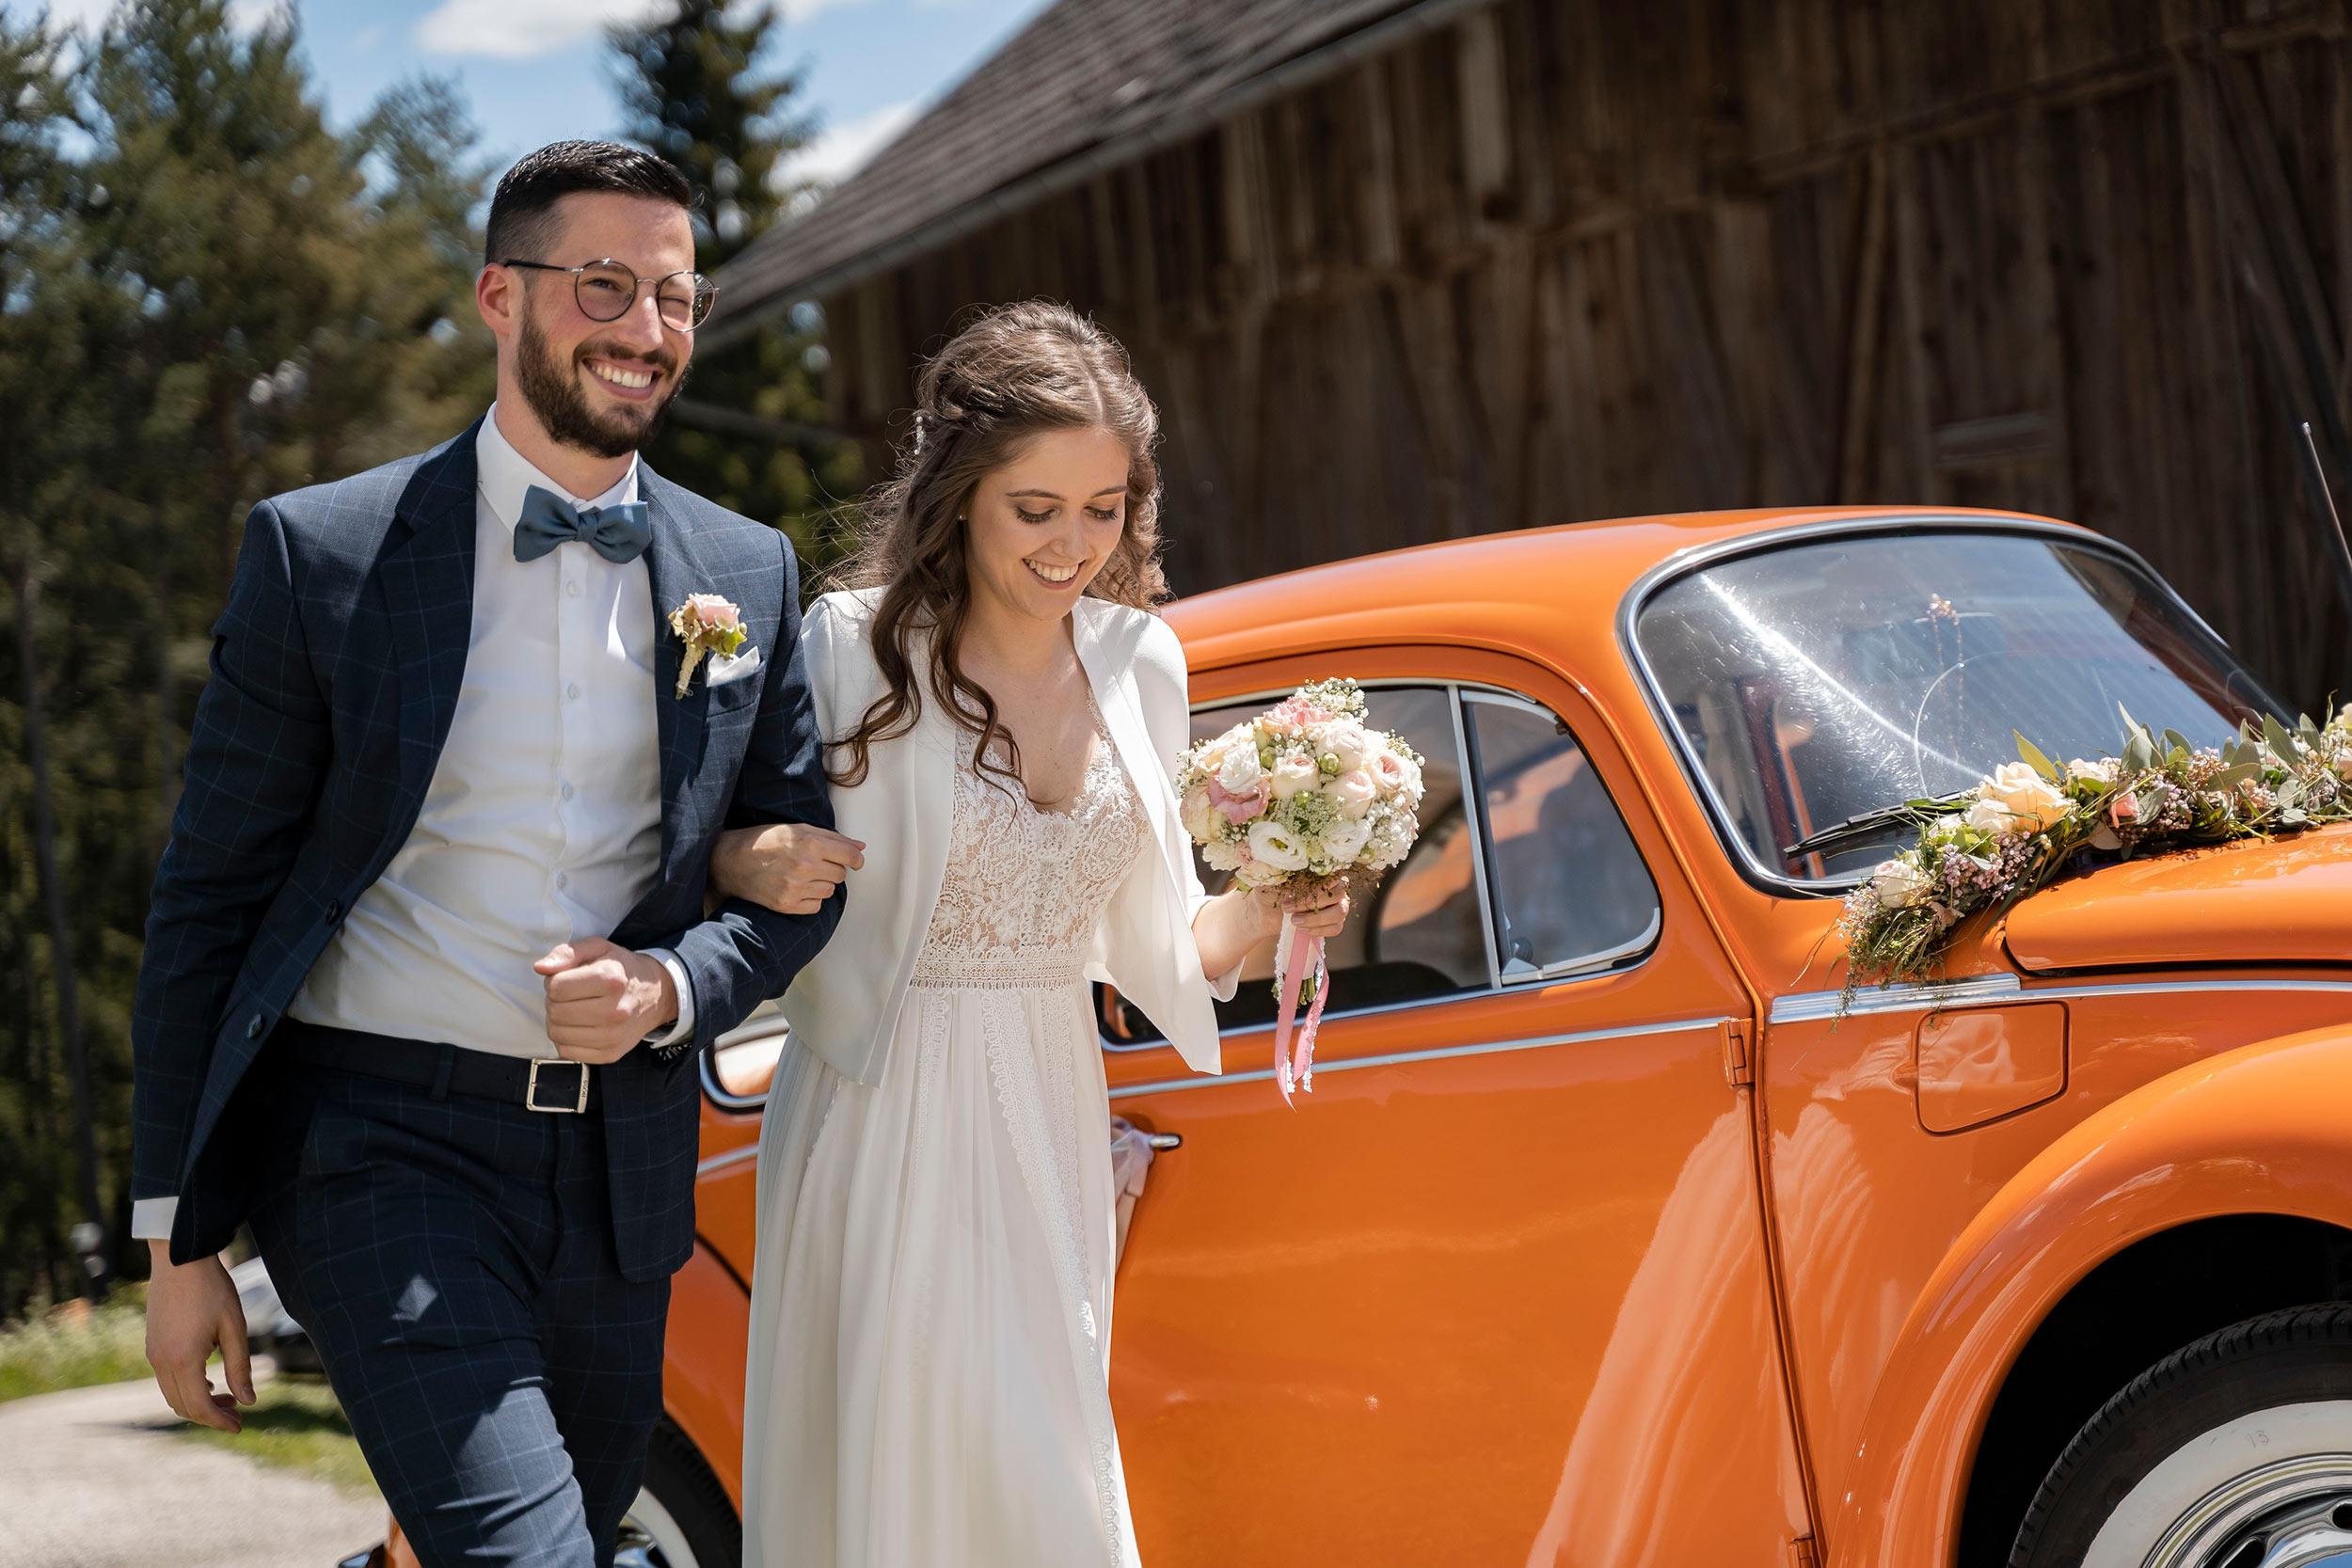 Evi_&_Christian_Hochzeit_01-06-2019_106